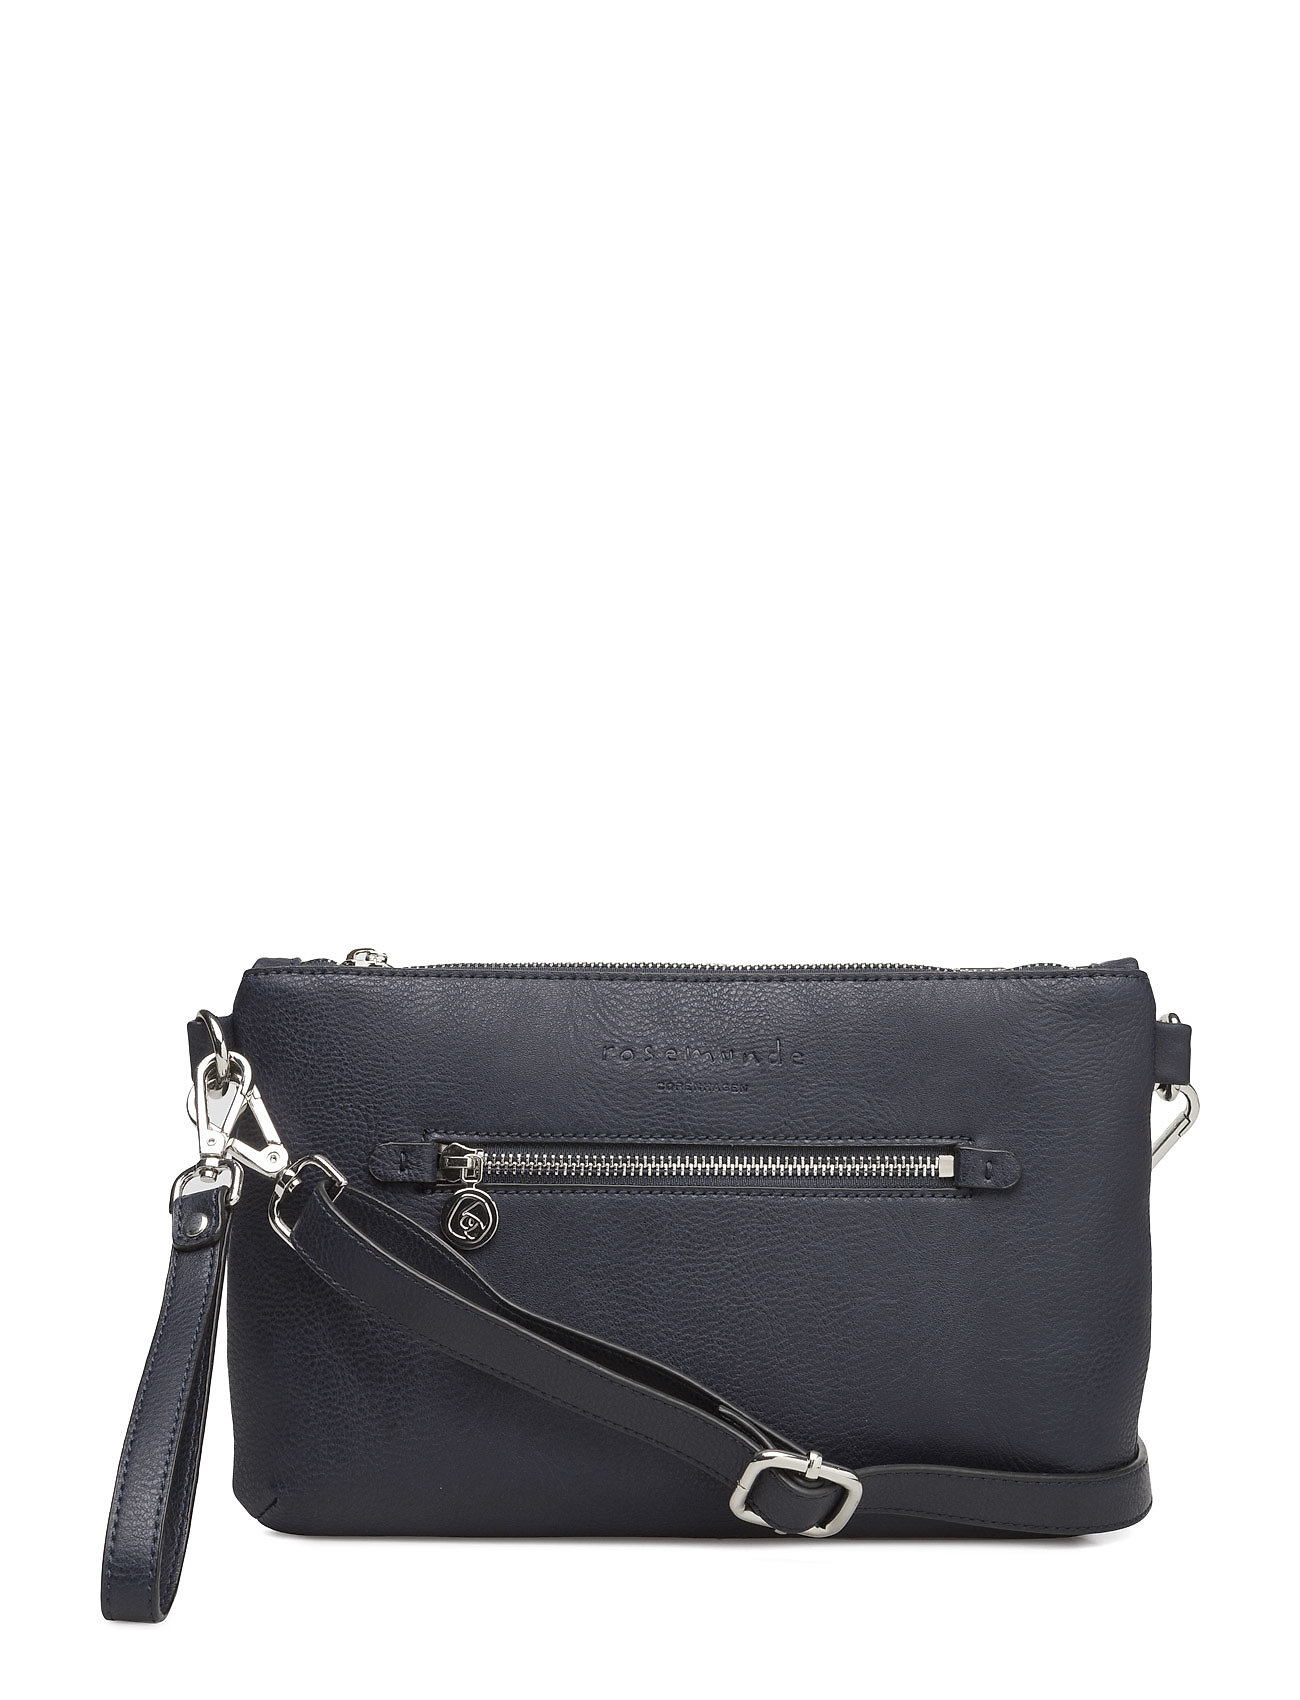 Clutch Rosemunde Små tasker til Damer i Mørkeblå